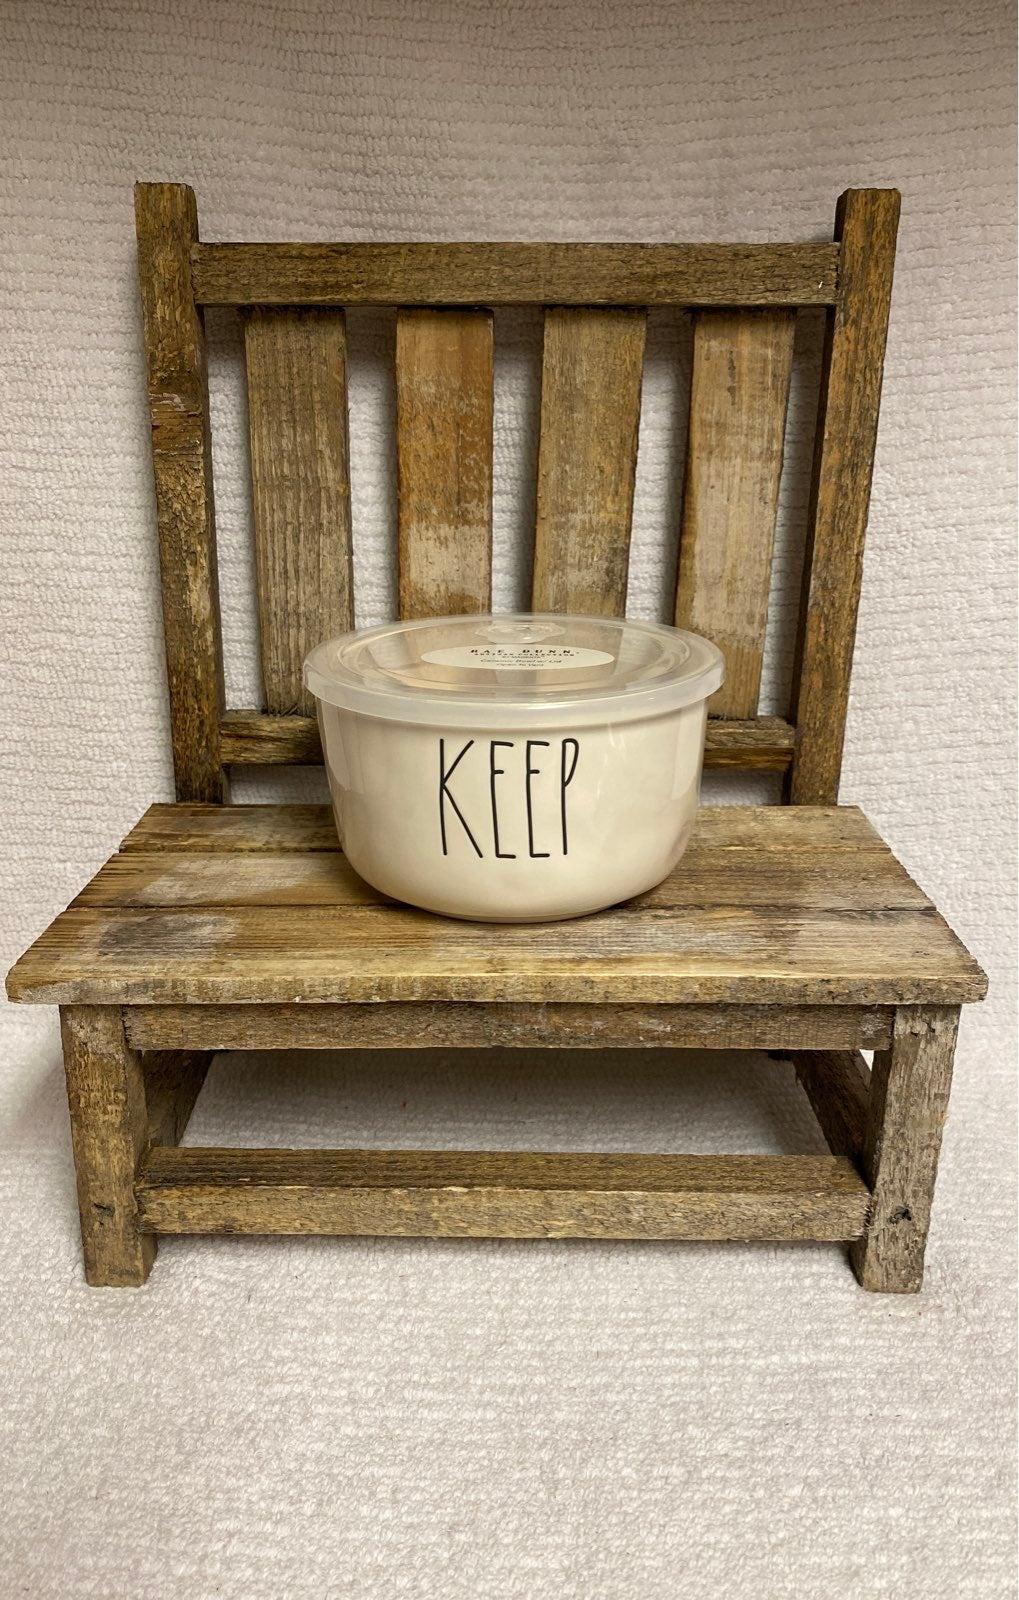 Rae Dunn Keep container